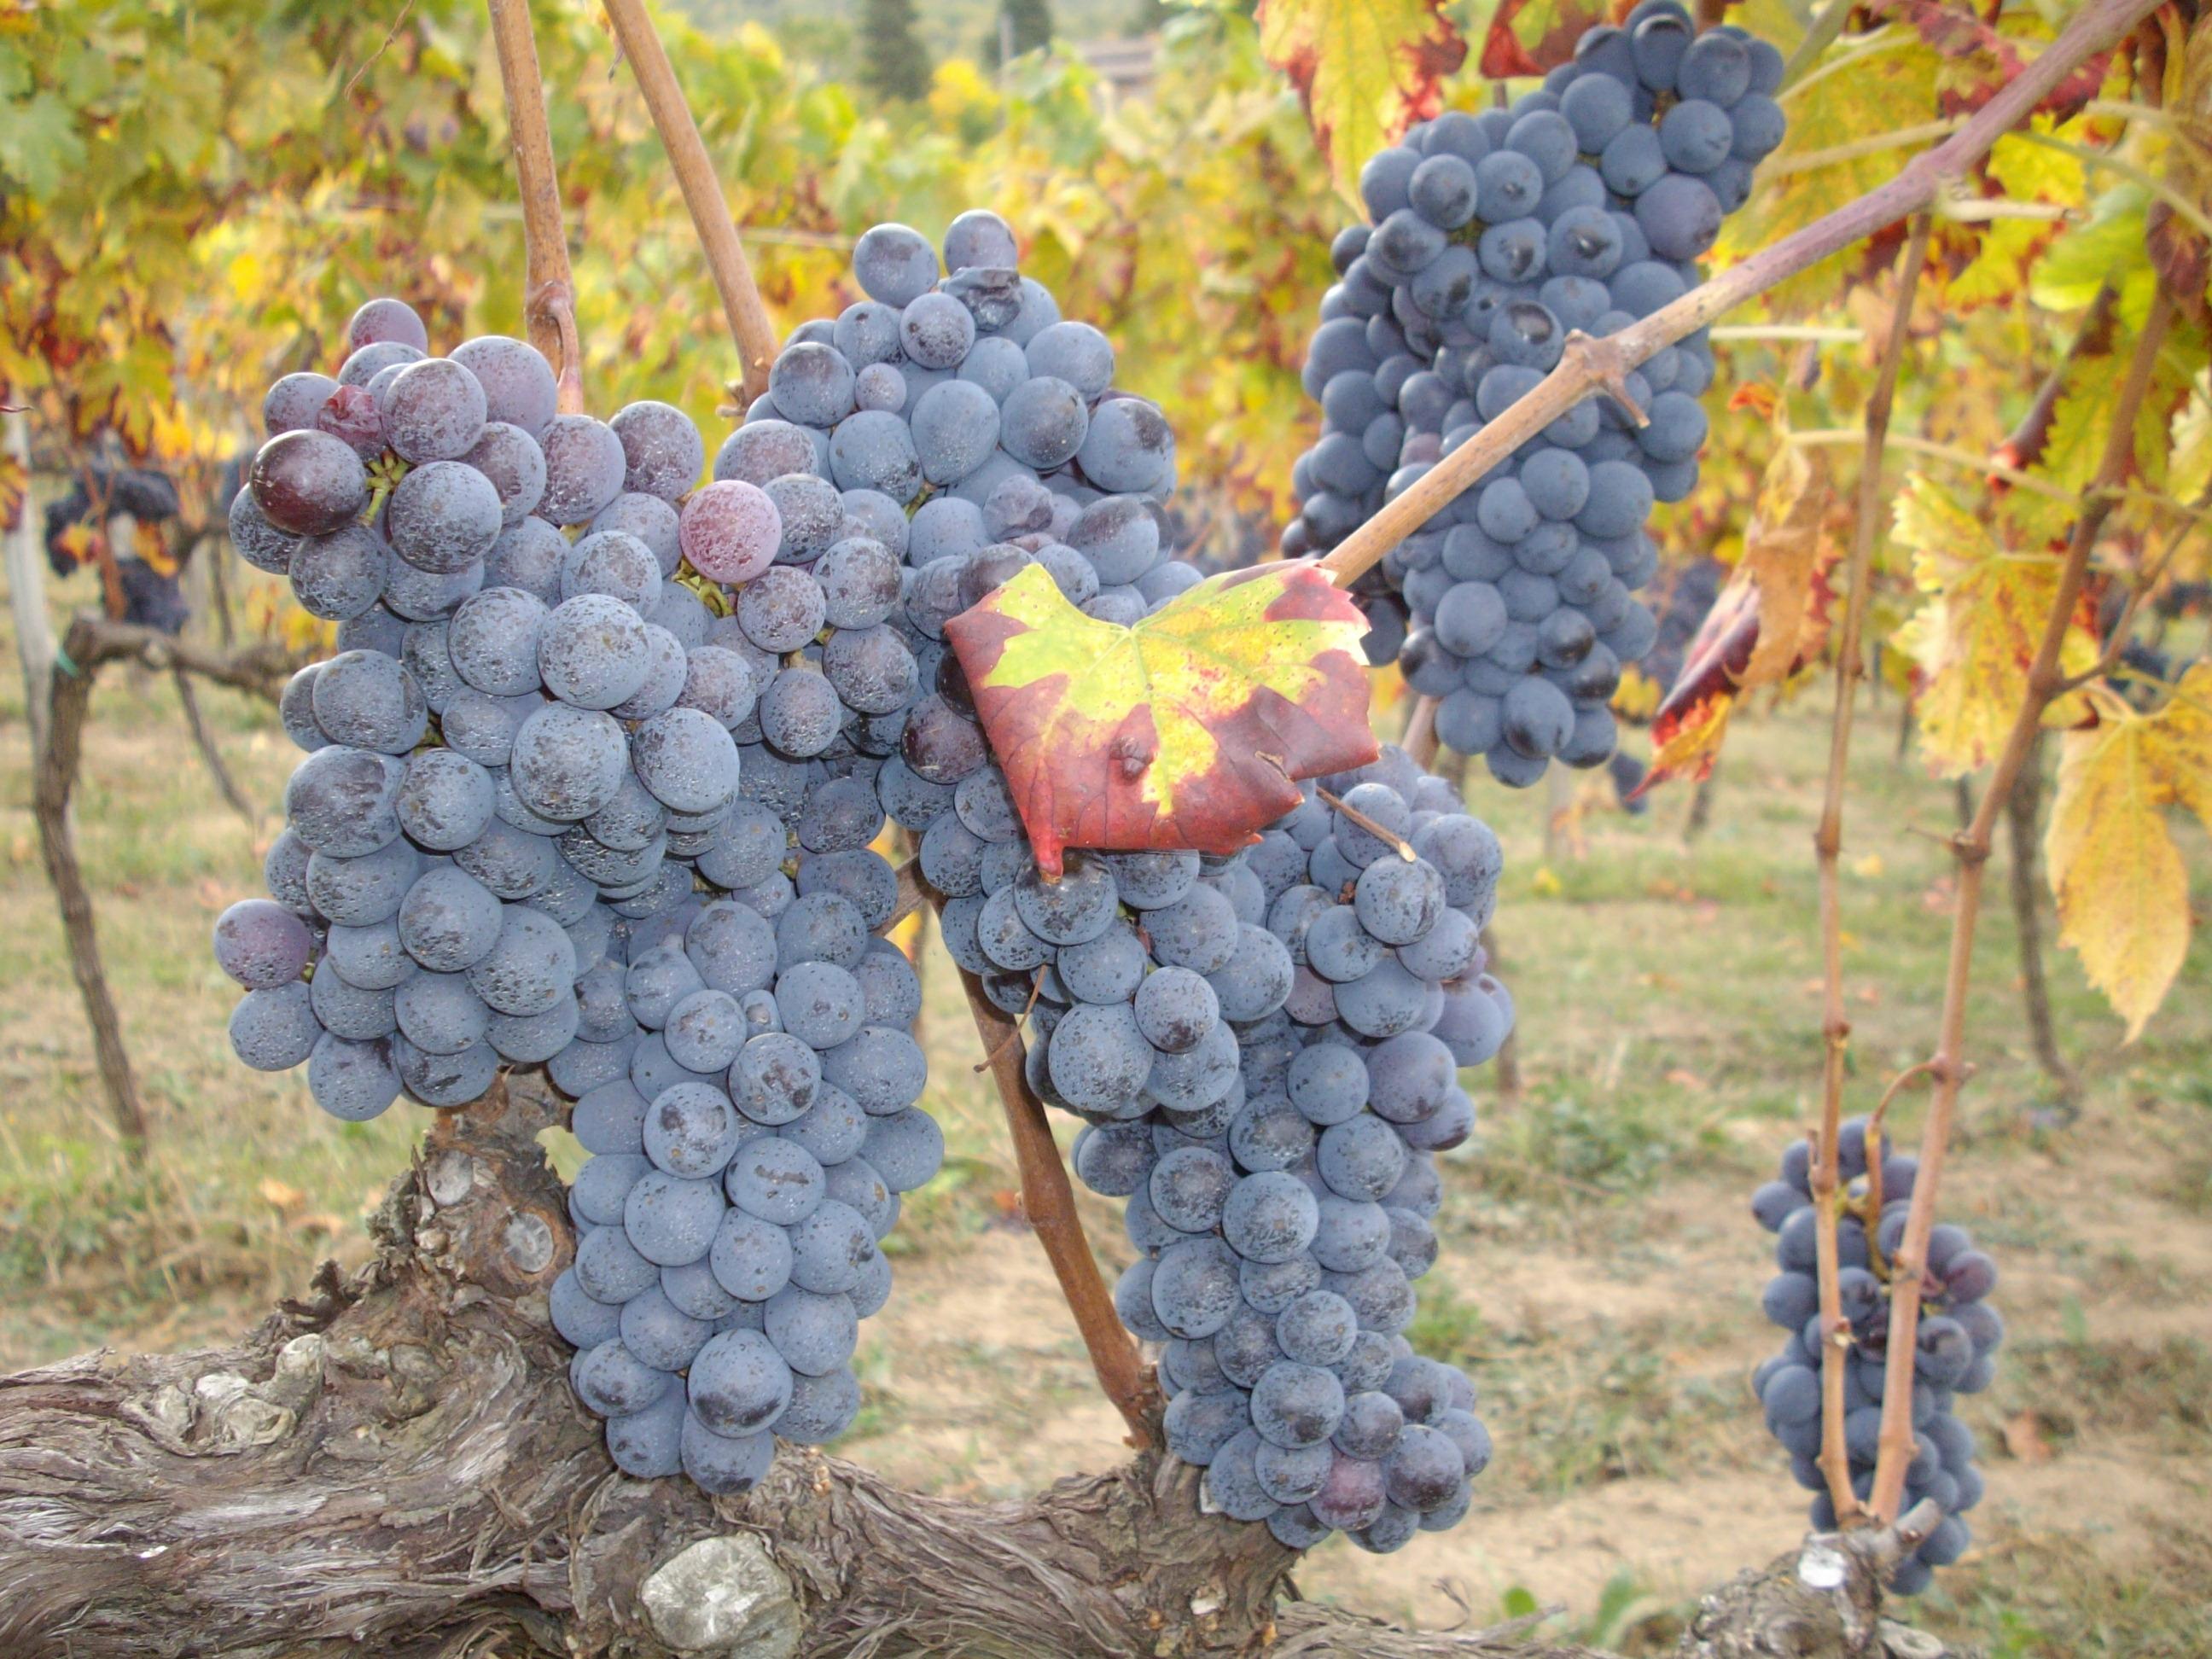 Grappoli uva sangiovese IMGP2706